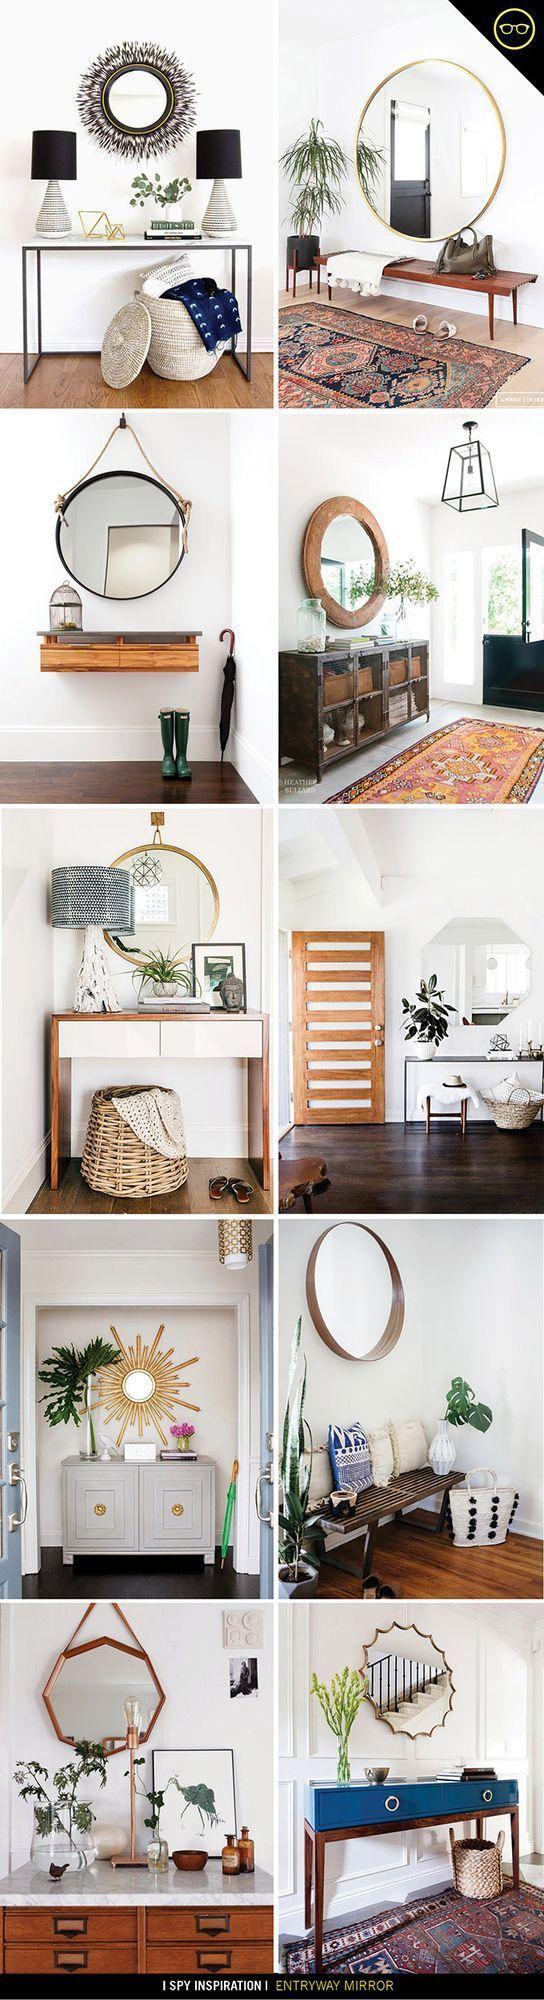 Best 25 entryway mirror ideas on pinterest entryway wall decor i spy design inspiration amipublicfo Images